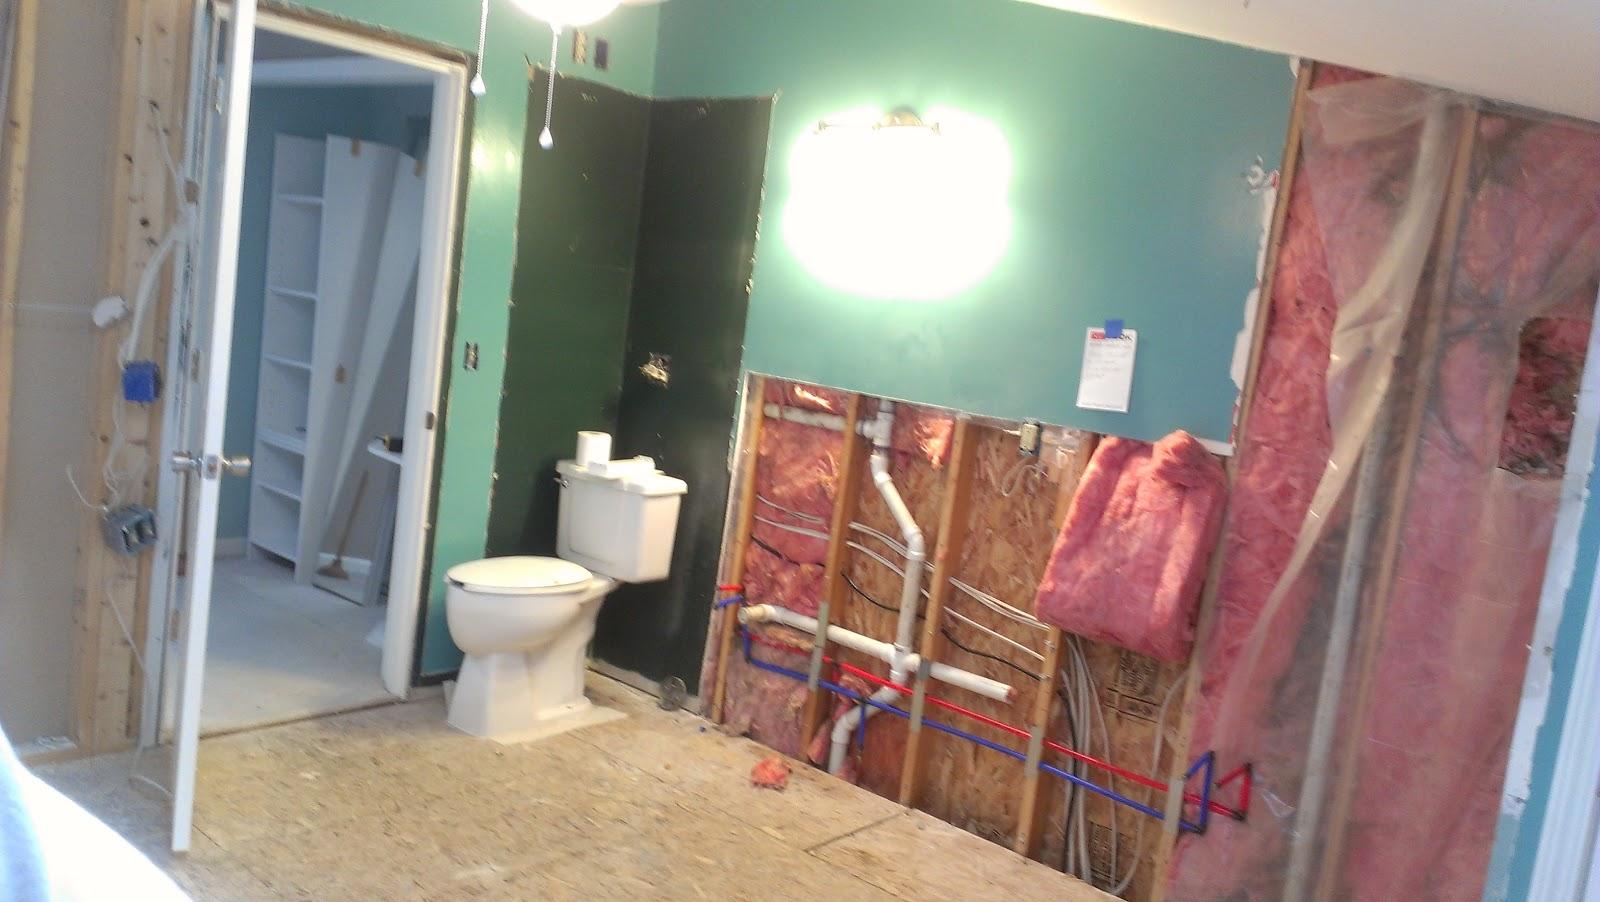 Lighting Basement Washroom Stairs: KeriING ON: Plumbing...continues